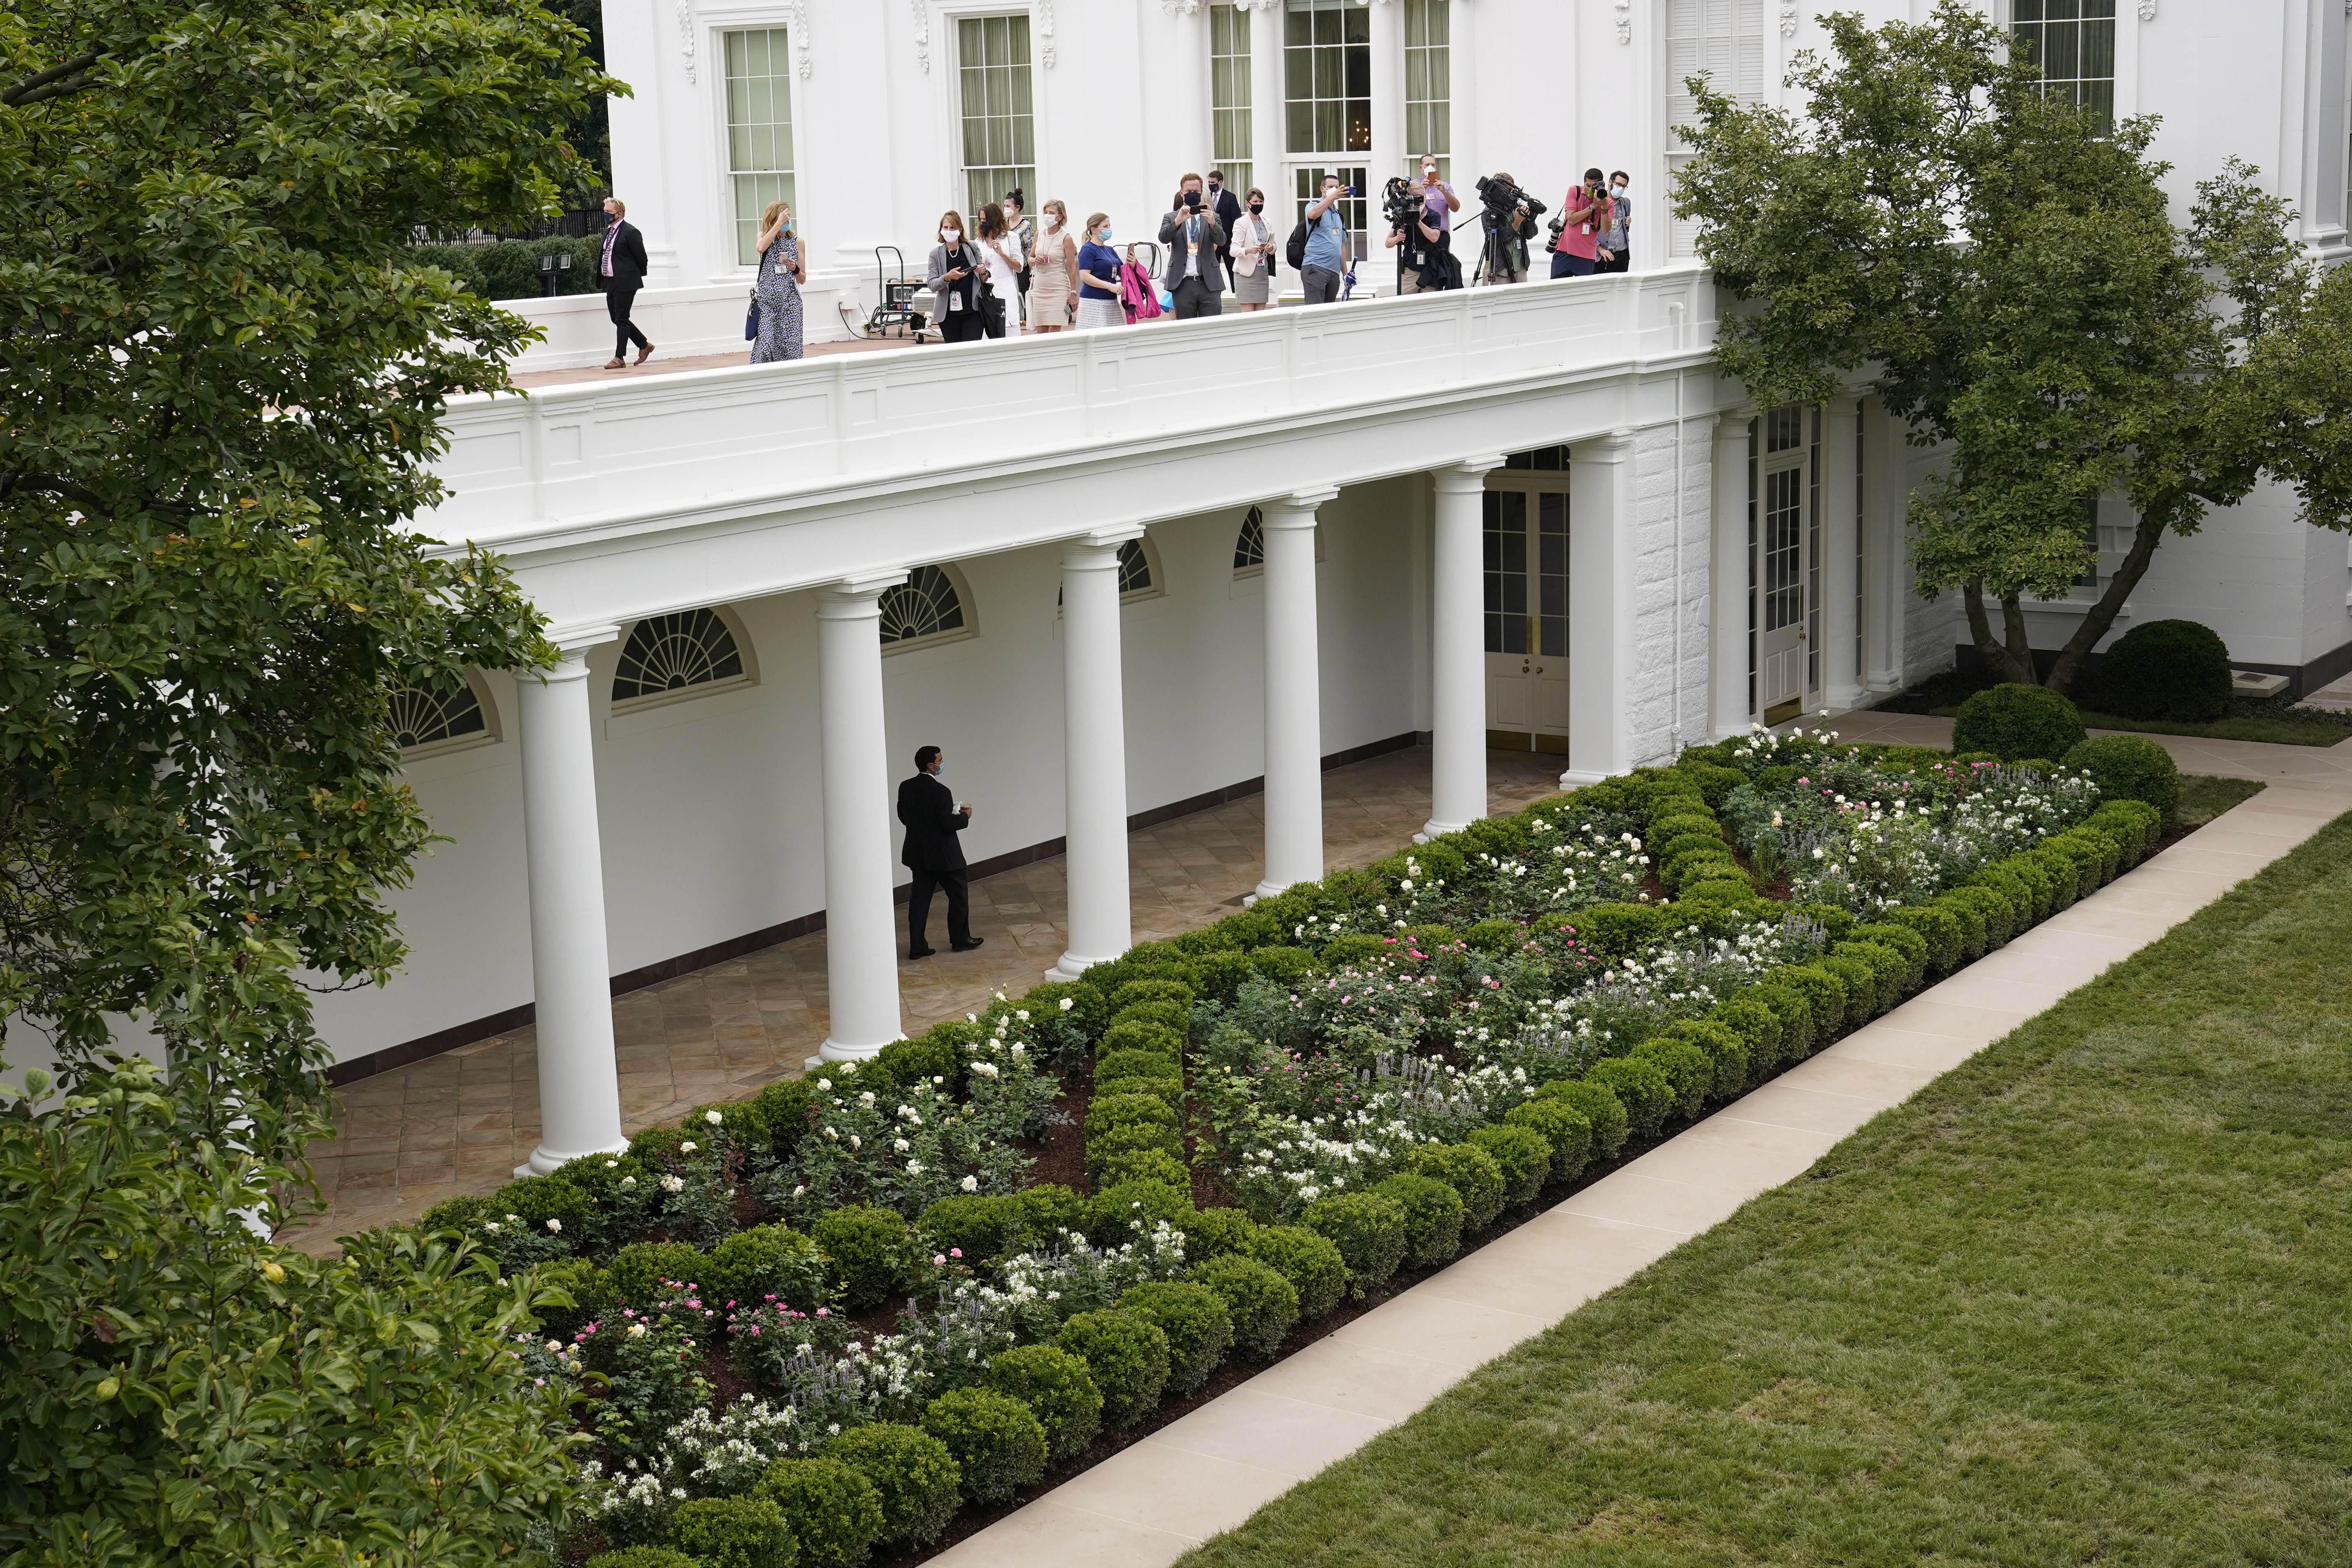 It Was Humbling Anne Arundel Natives Help Design Install New White House Rose Garden Seen During Melania Trump S Rnc Speech Capital Gazette